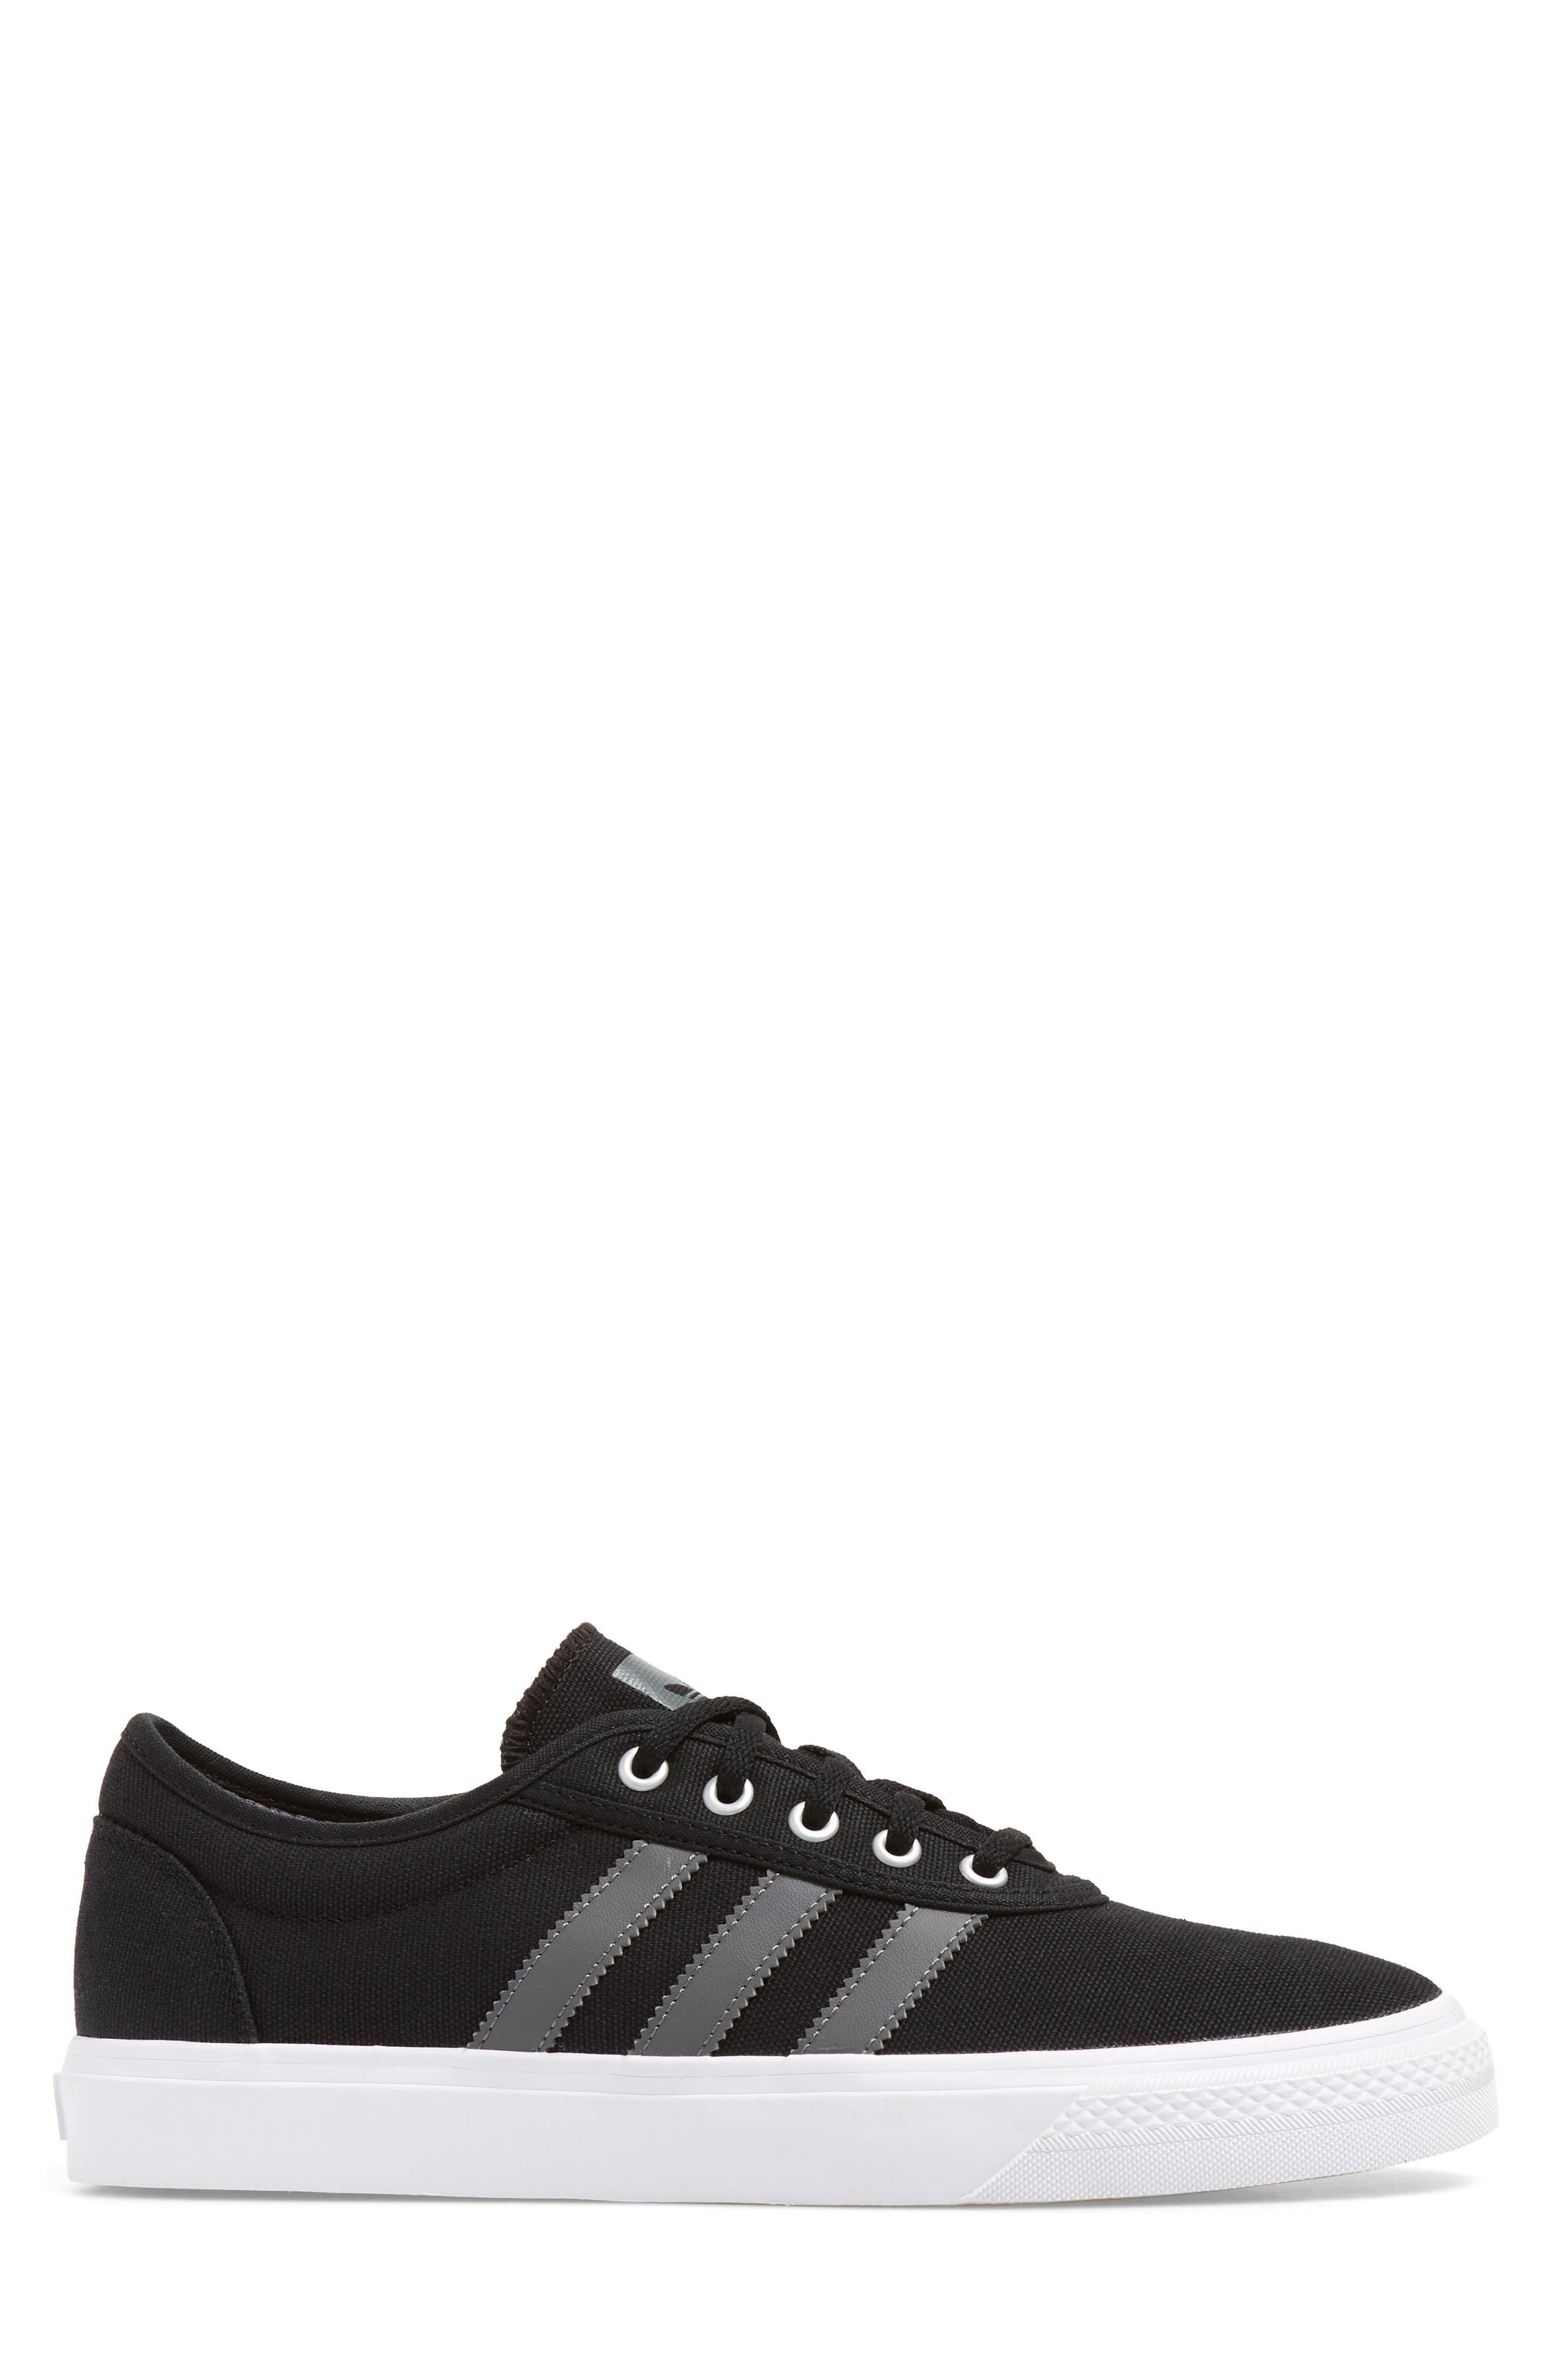 Adiease Skate Sneaker,                             Alternate thumbnail 3, color,                             001